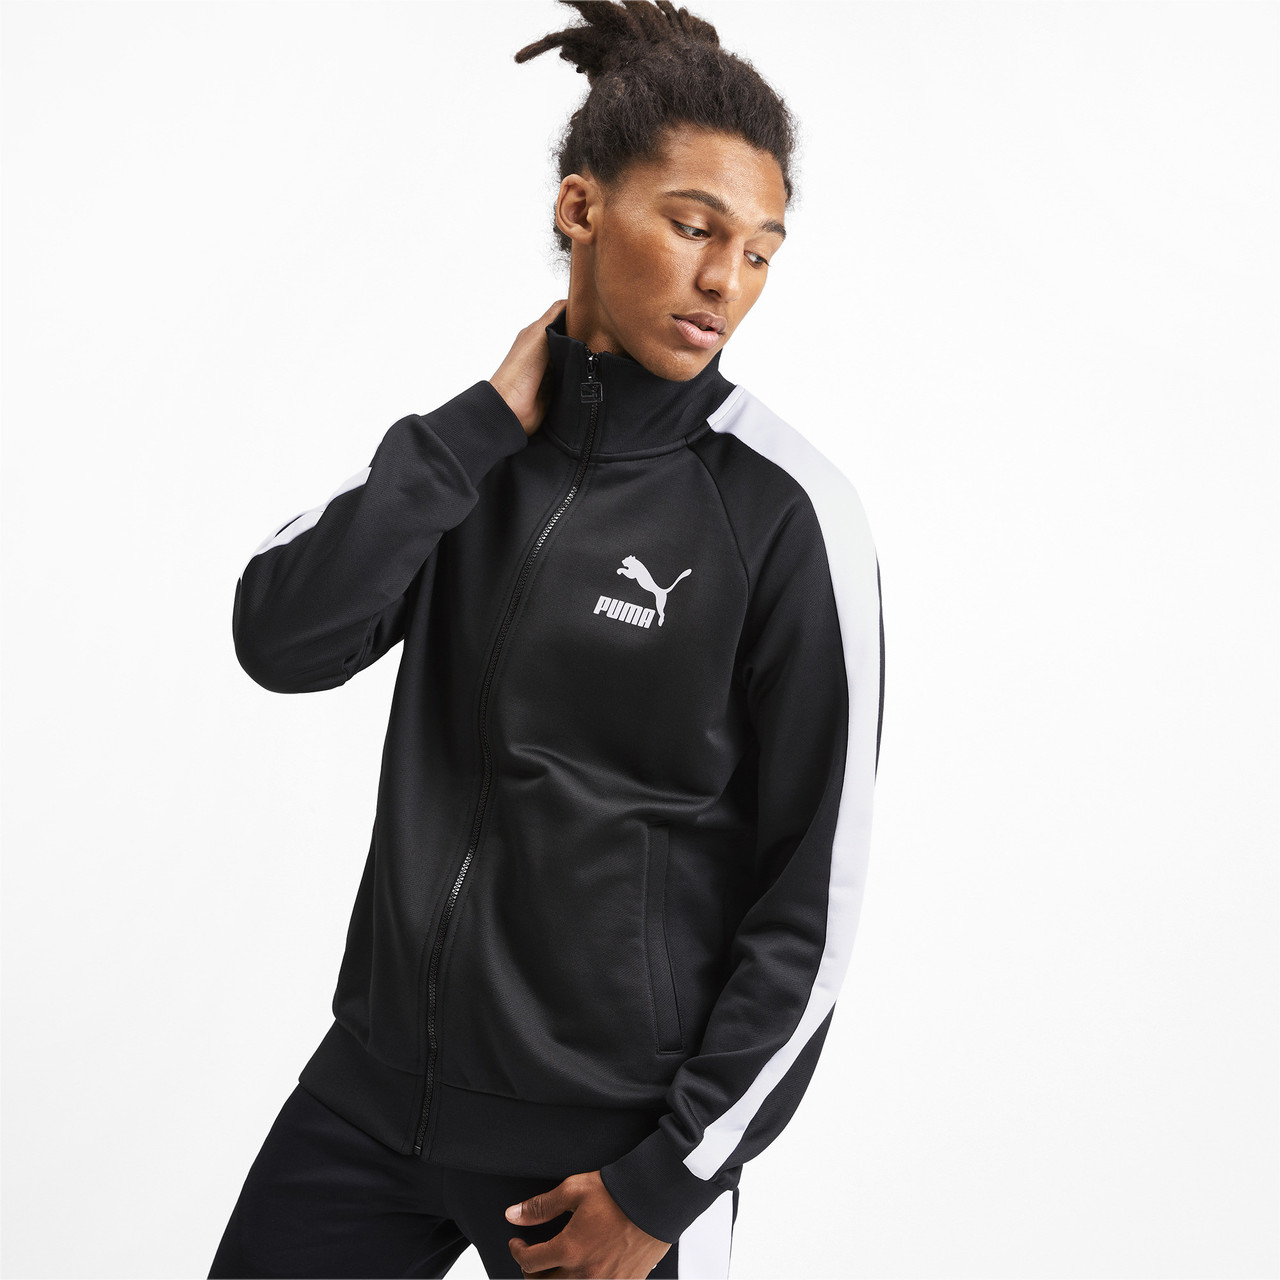 Спортивная куртка мужская Iconic T7 Men's Track Jacket